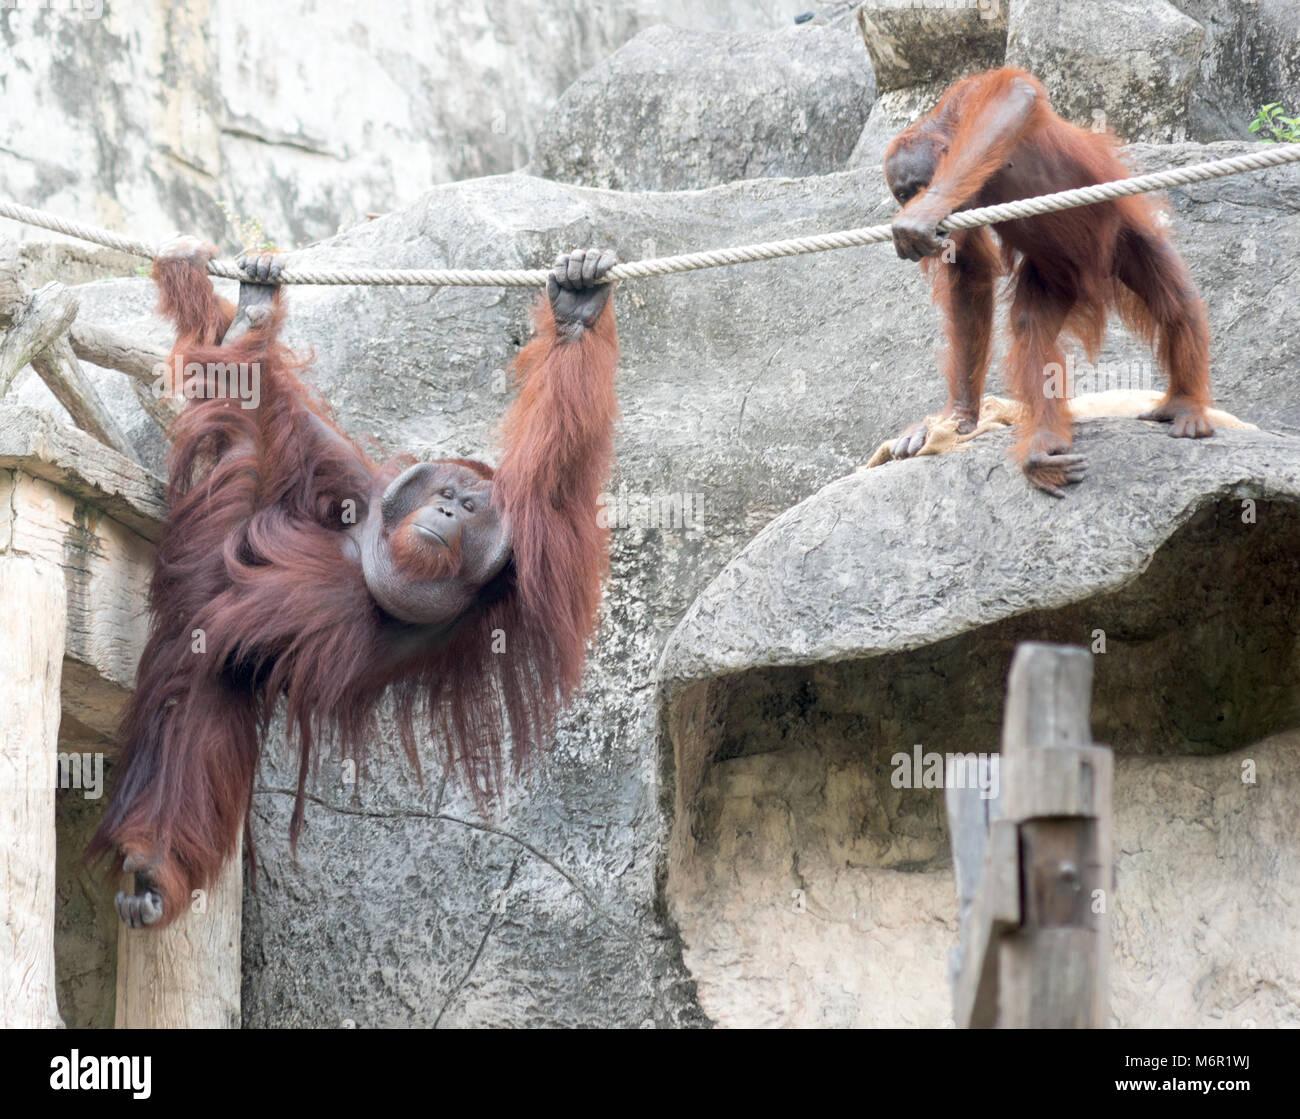 Pair of orangutangs in the Zoo Stock Photo